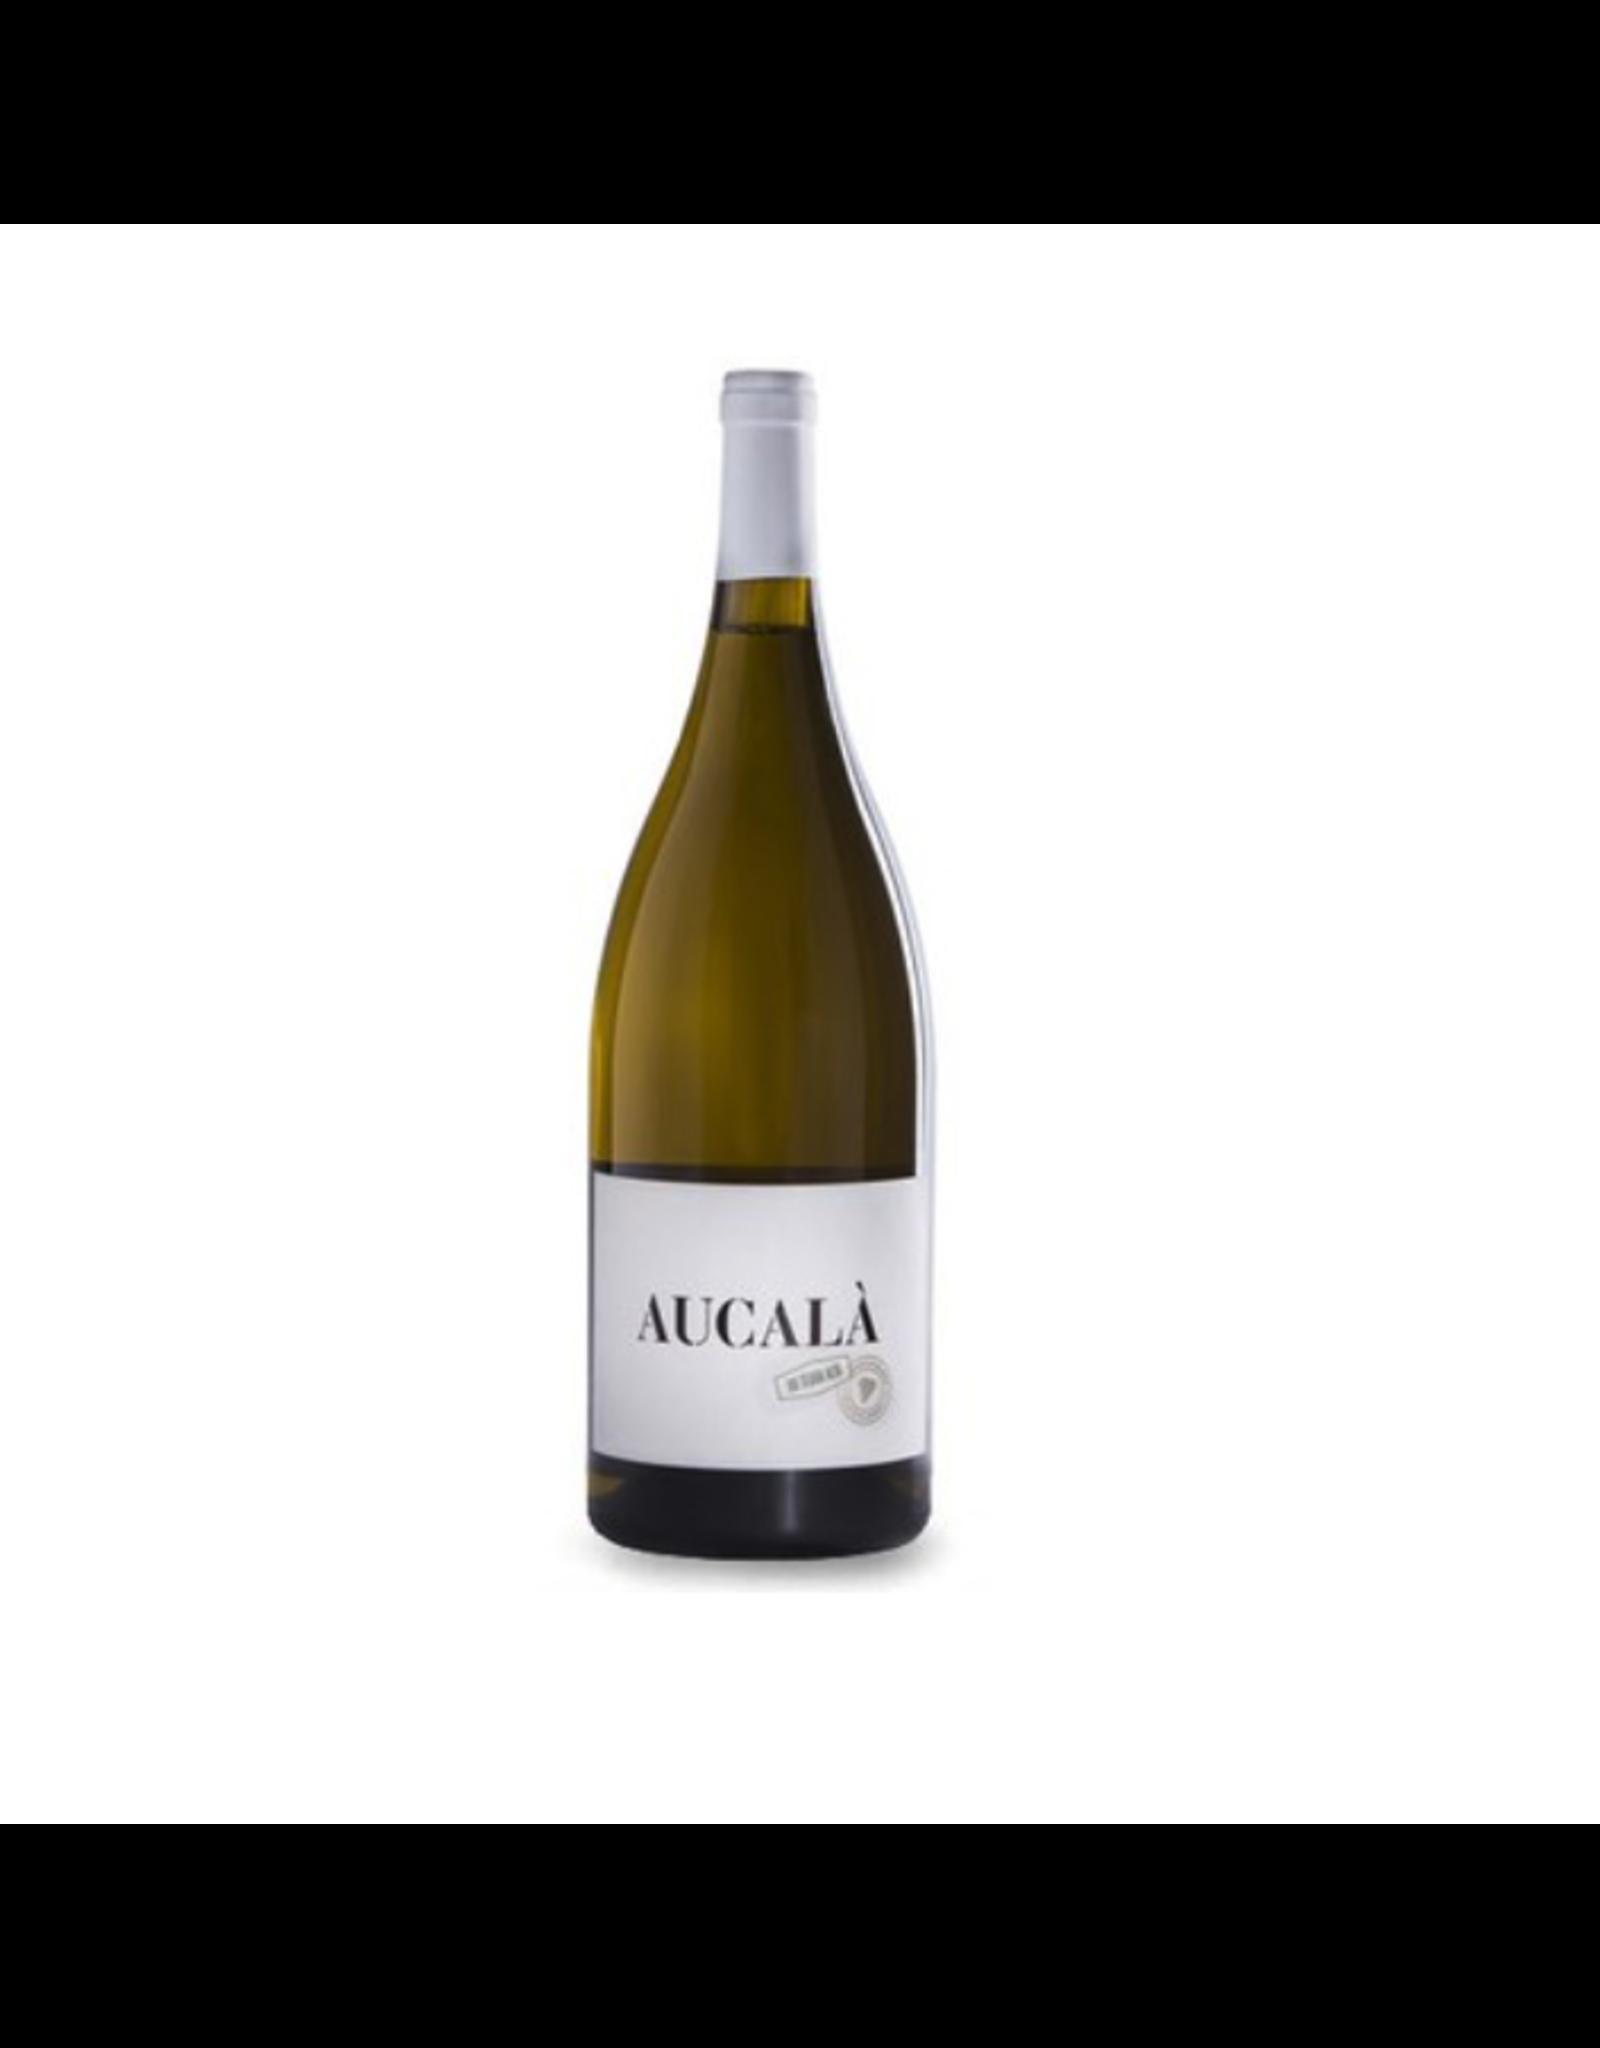 Serra & Barcelo Aucala Blanca 2017 - BOTTLE